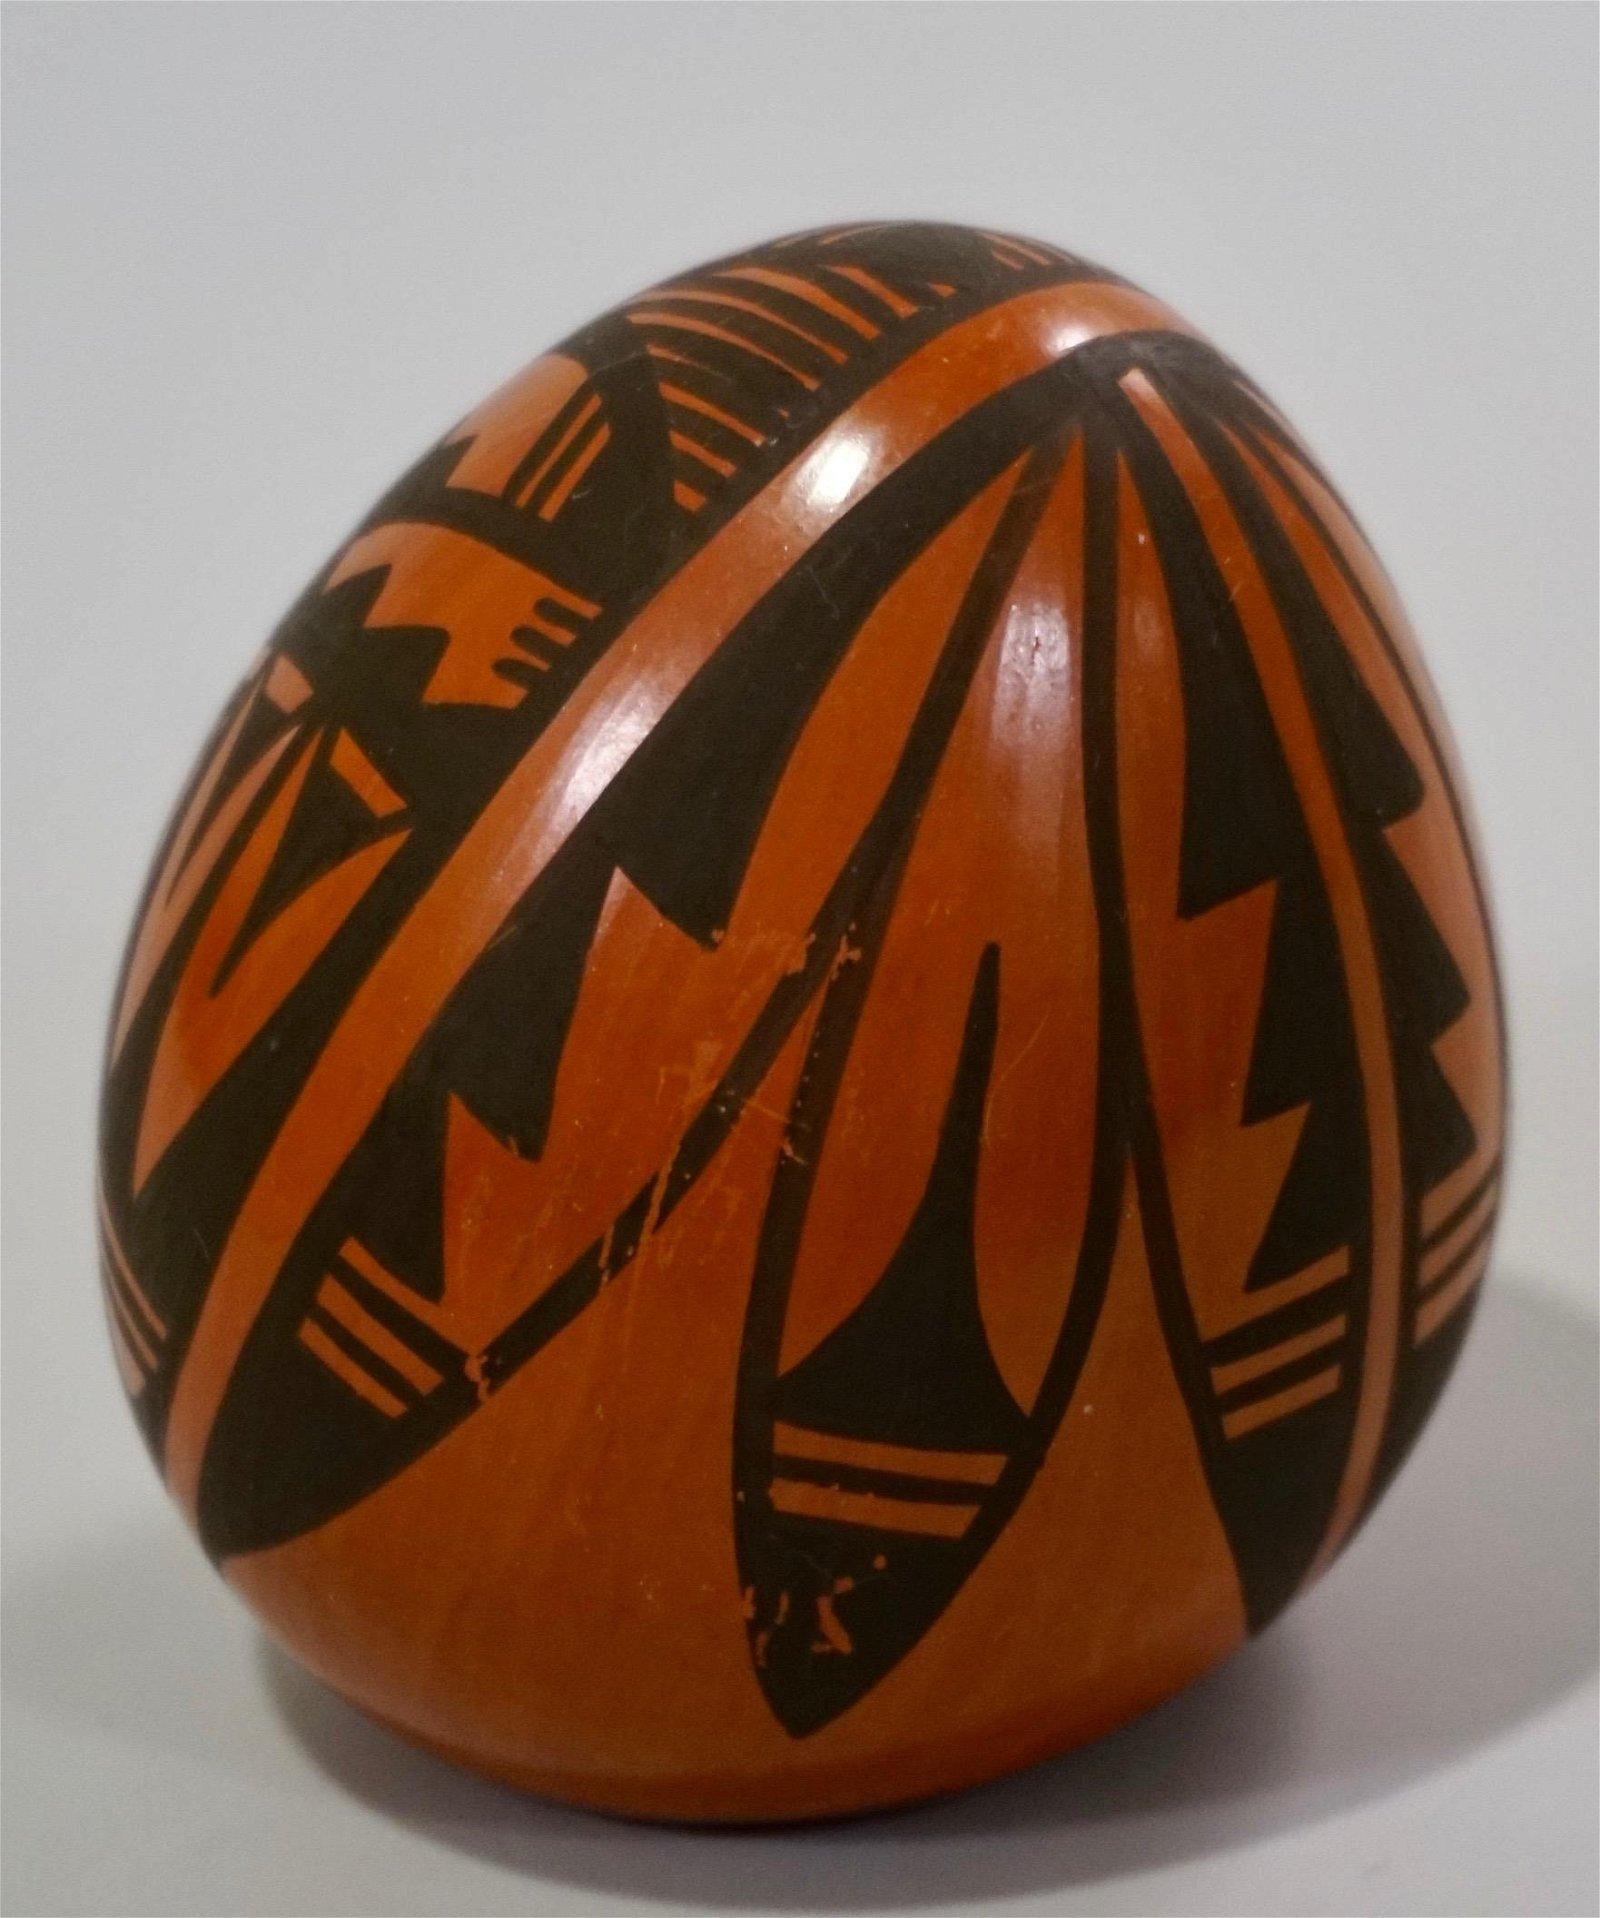 Vintage Ethnic Carved Pottery Egg Shaped Ornament